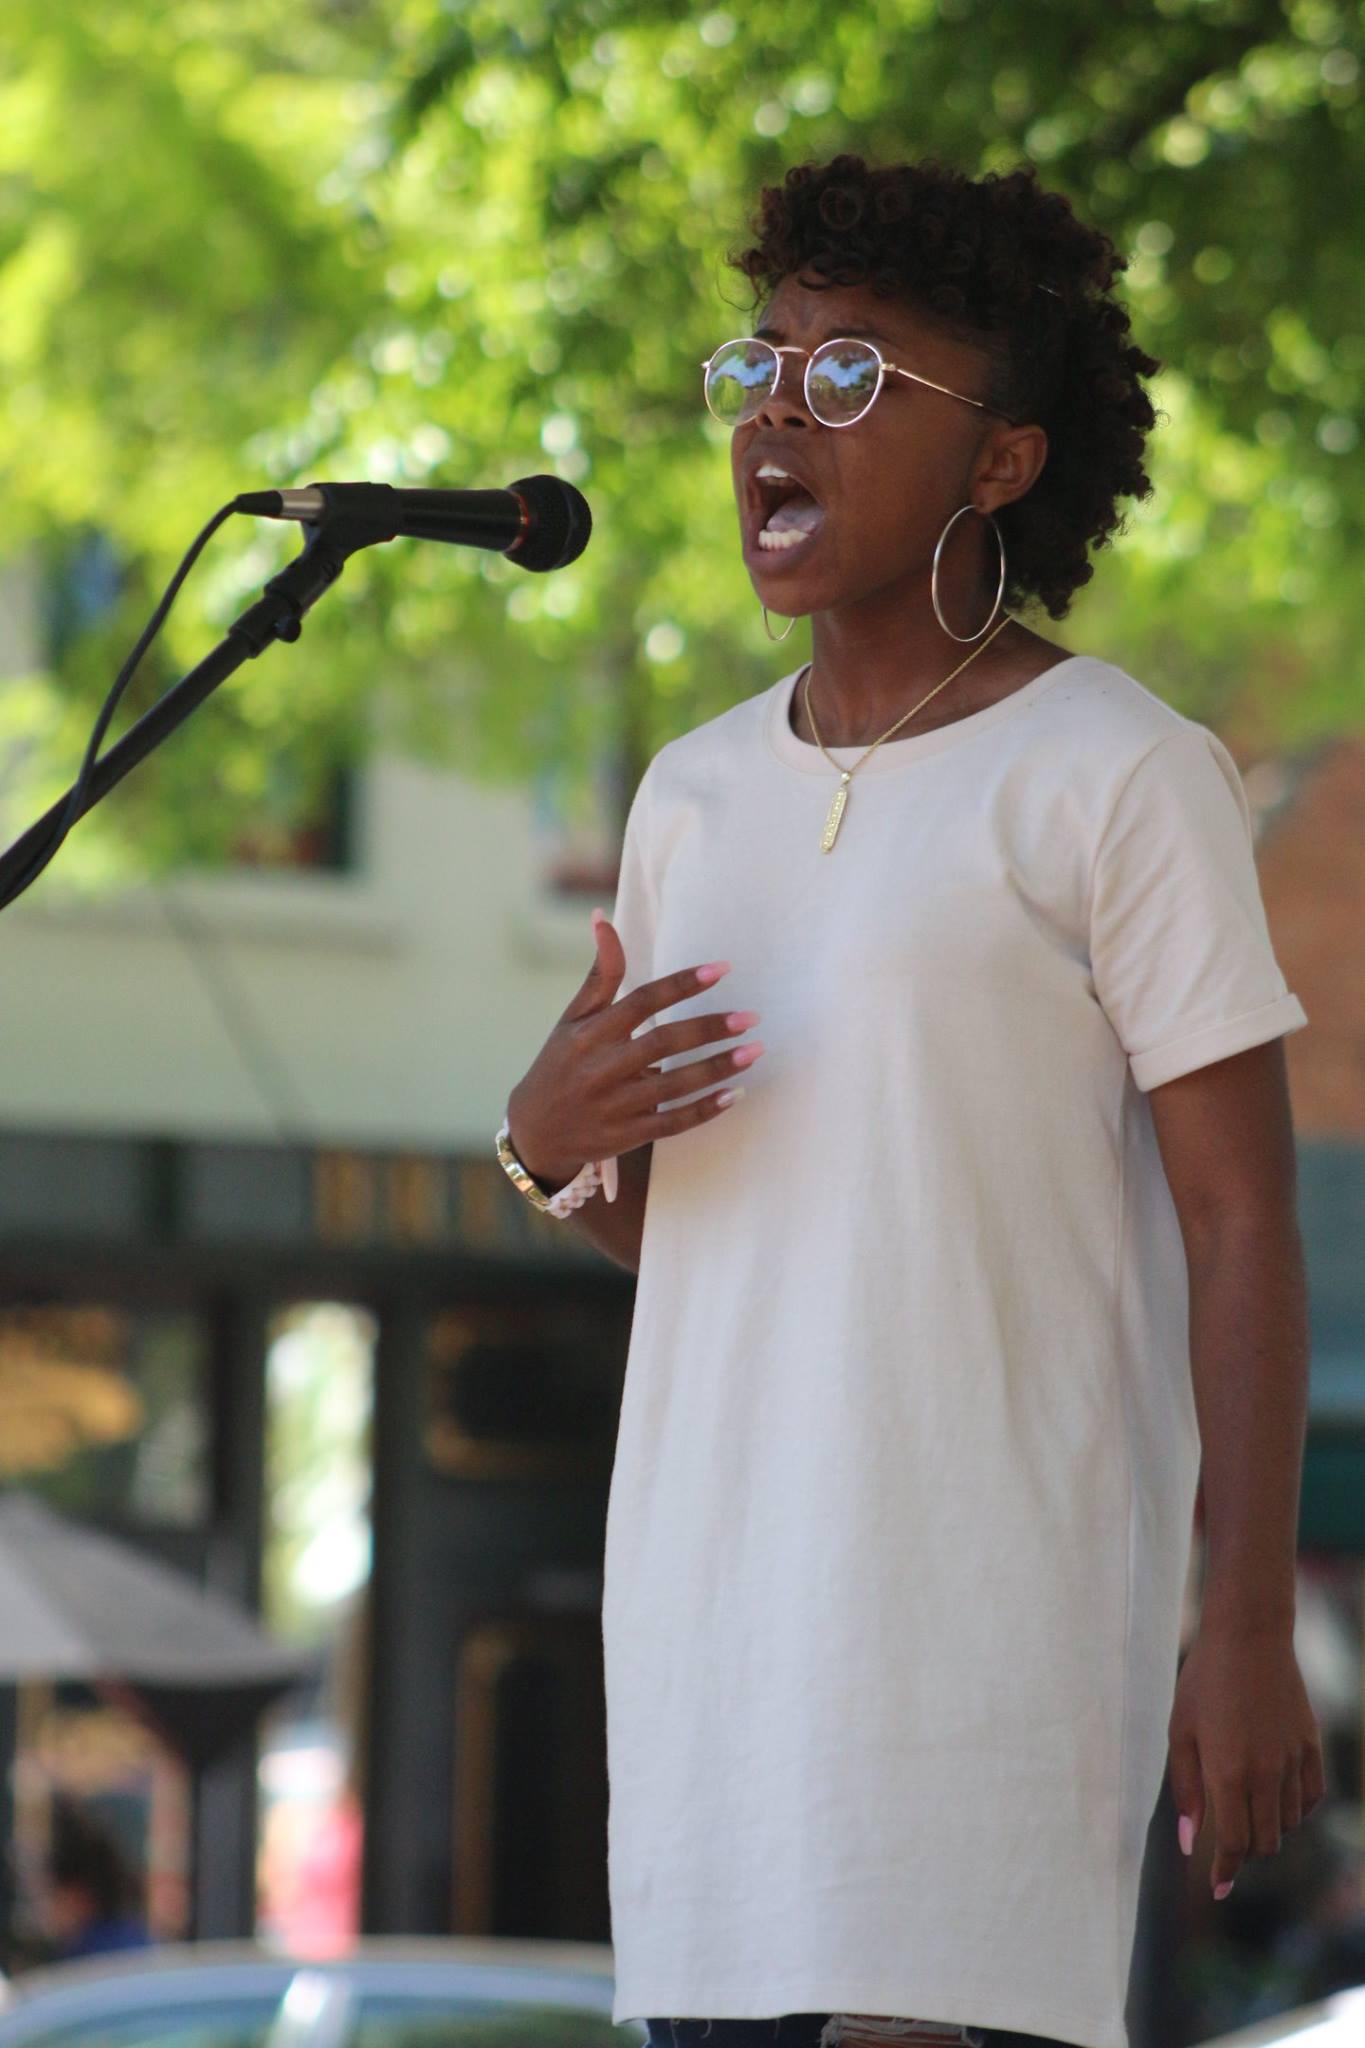 Fountain City Teen Poetry Open Mic